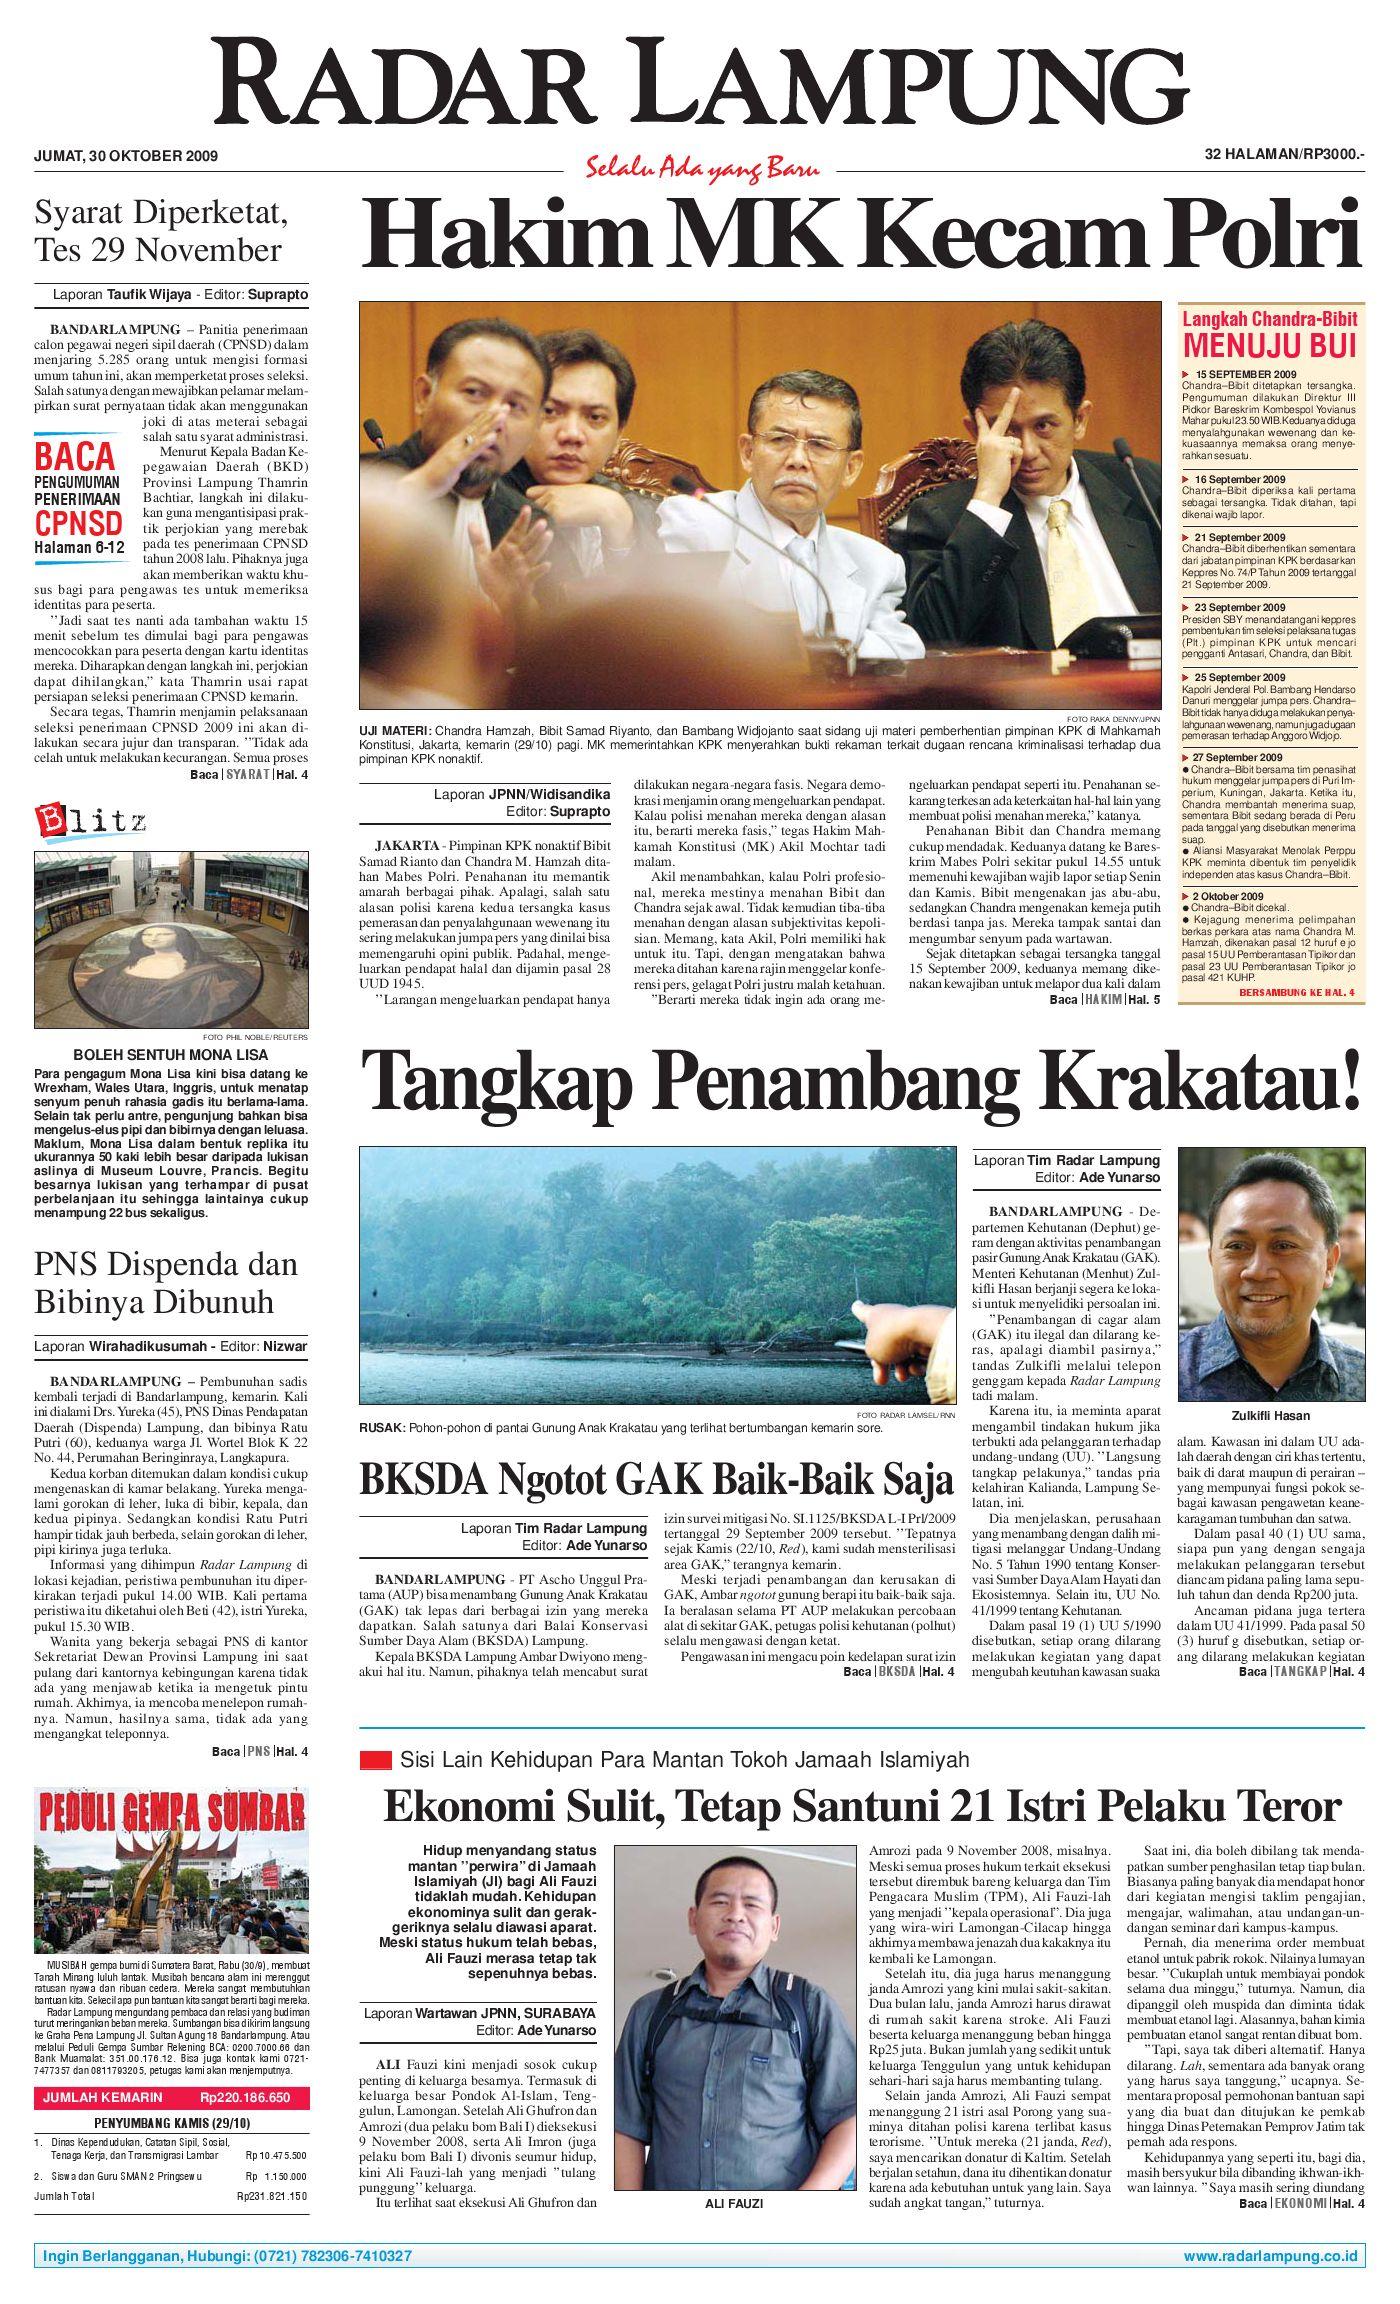 Radar Lampung Jumat 30 Oktober 2009 By Issuu Celana Pria Pendek Dry Fit Merah Cln 654